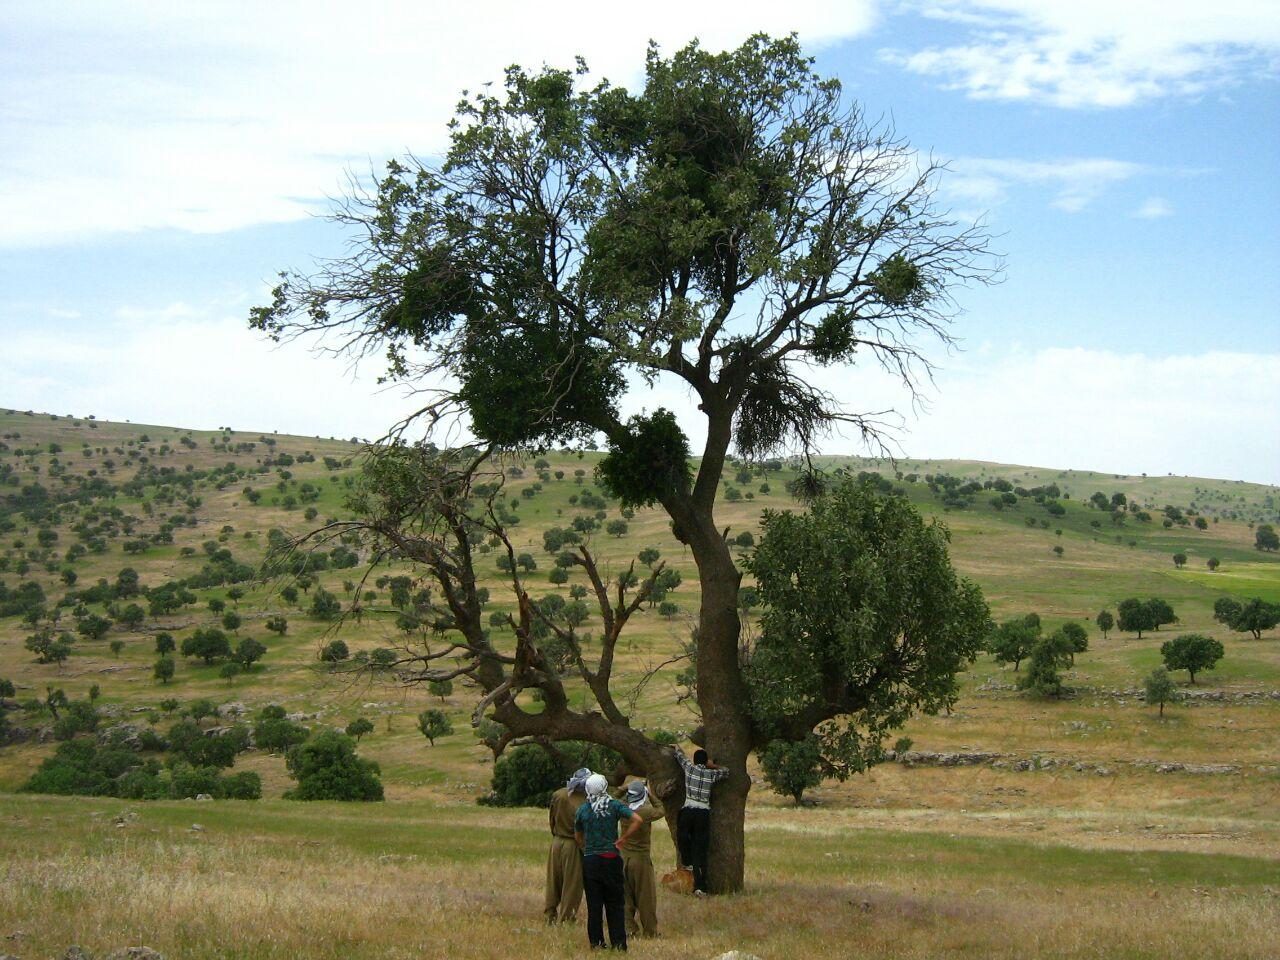 لورانتوس بر تنه درختان